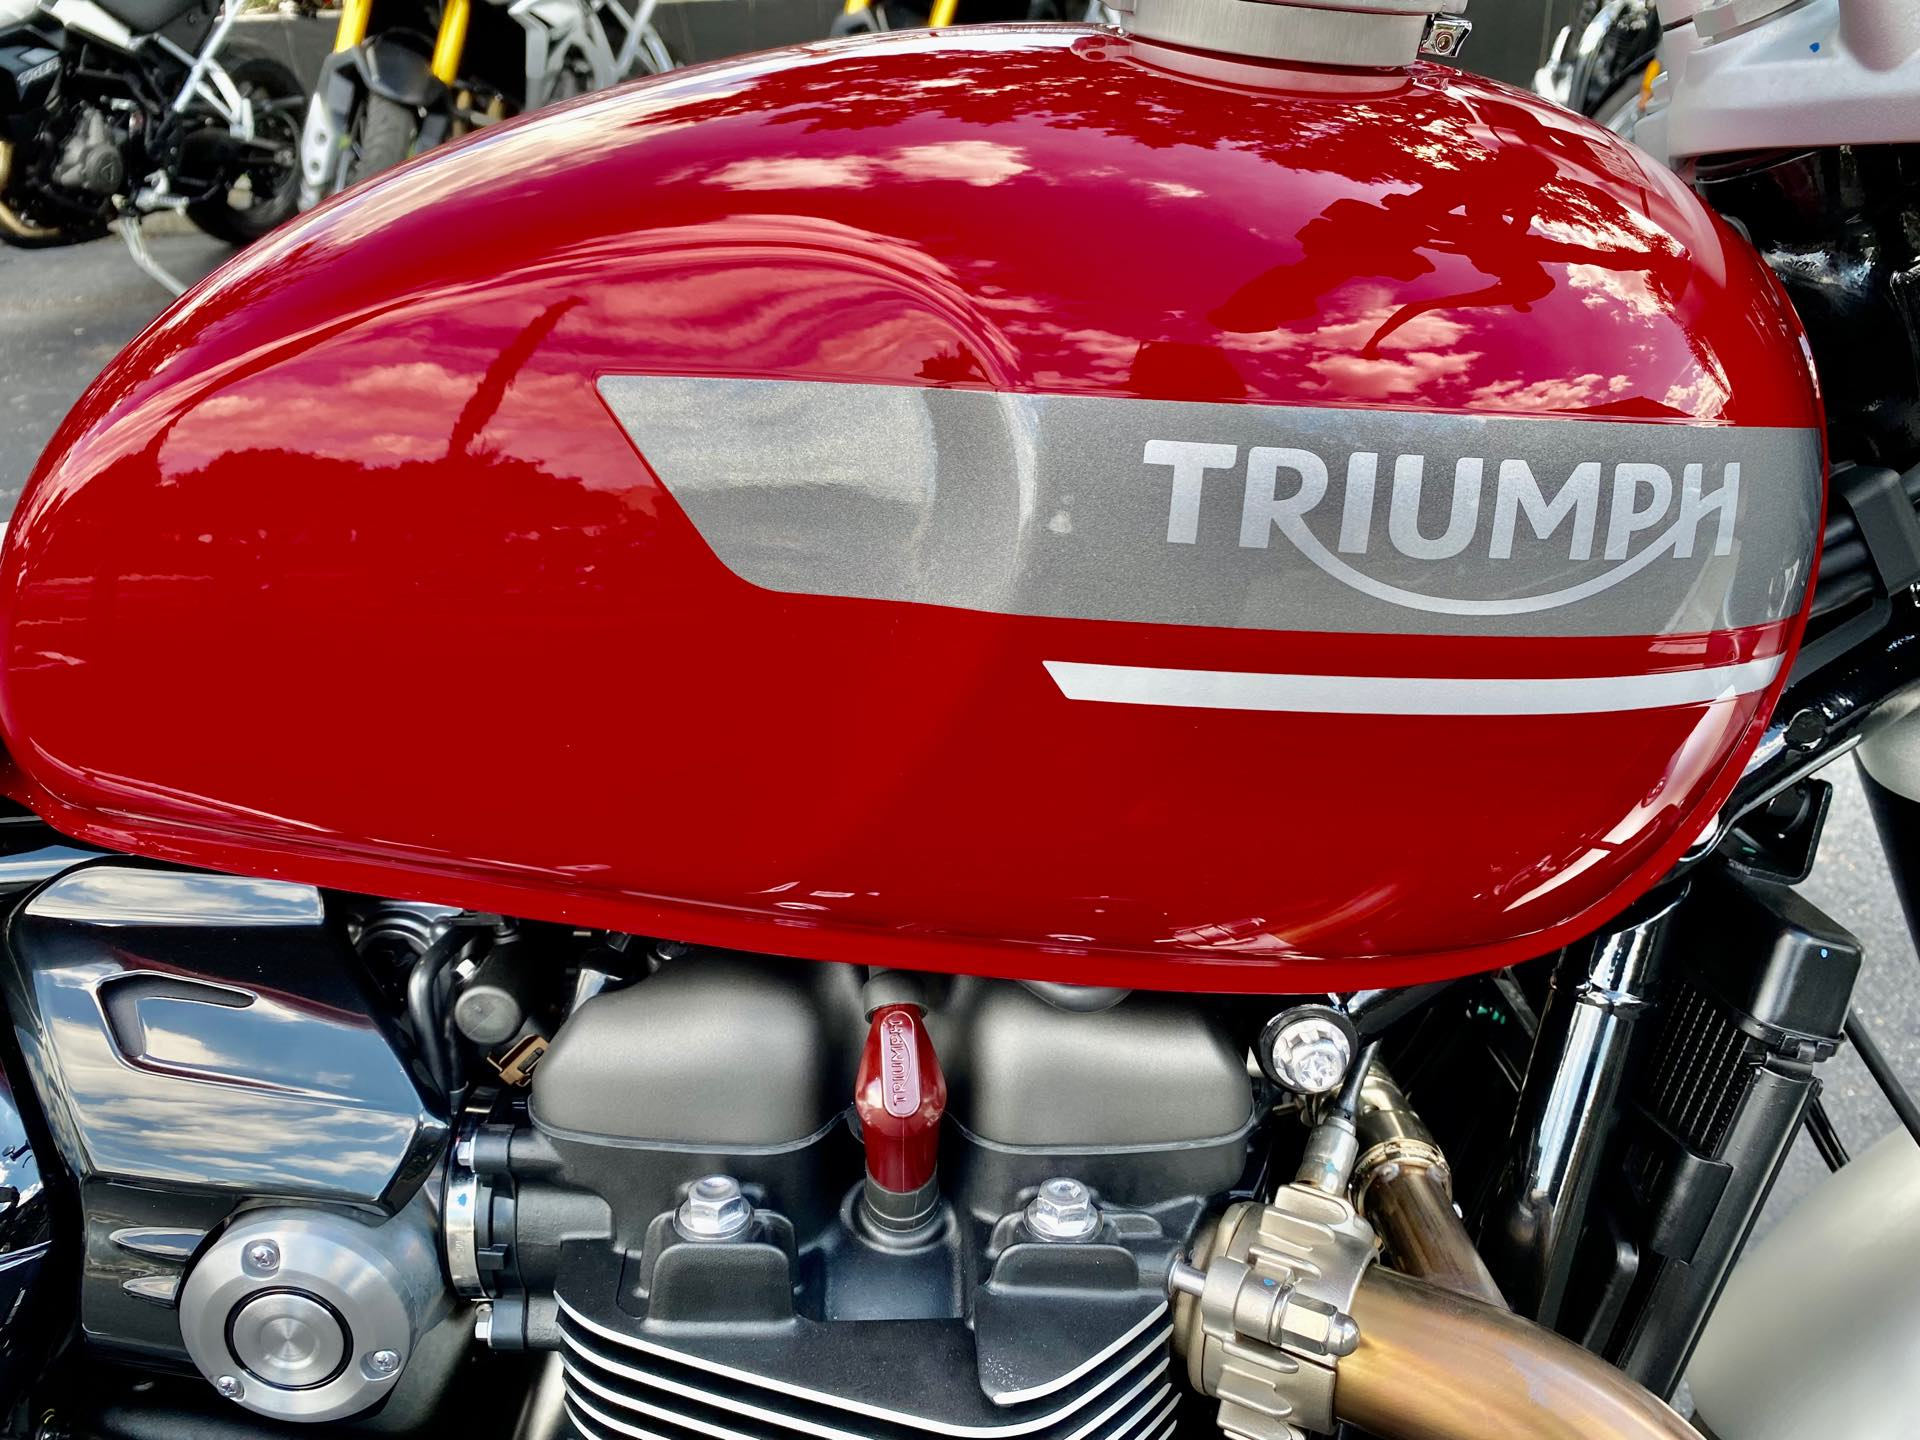 2022 Triumph Speed Twin Base at Tampa Triumph, Tampa, FL 33614